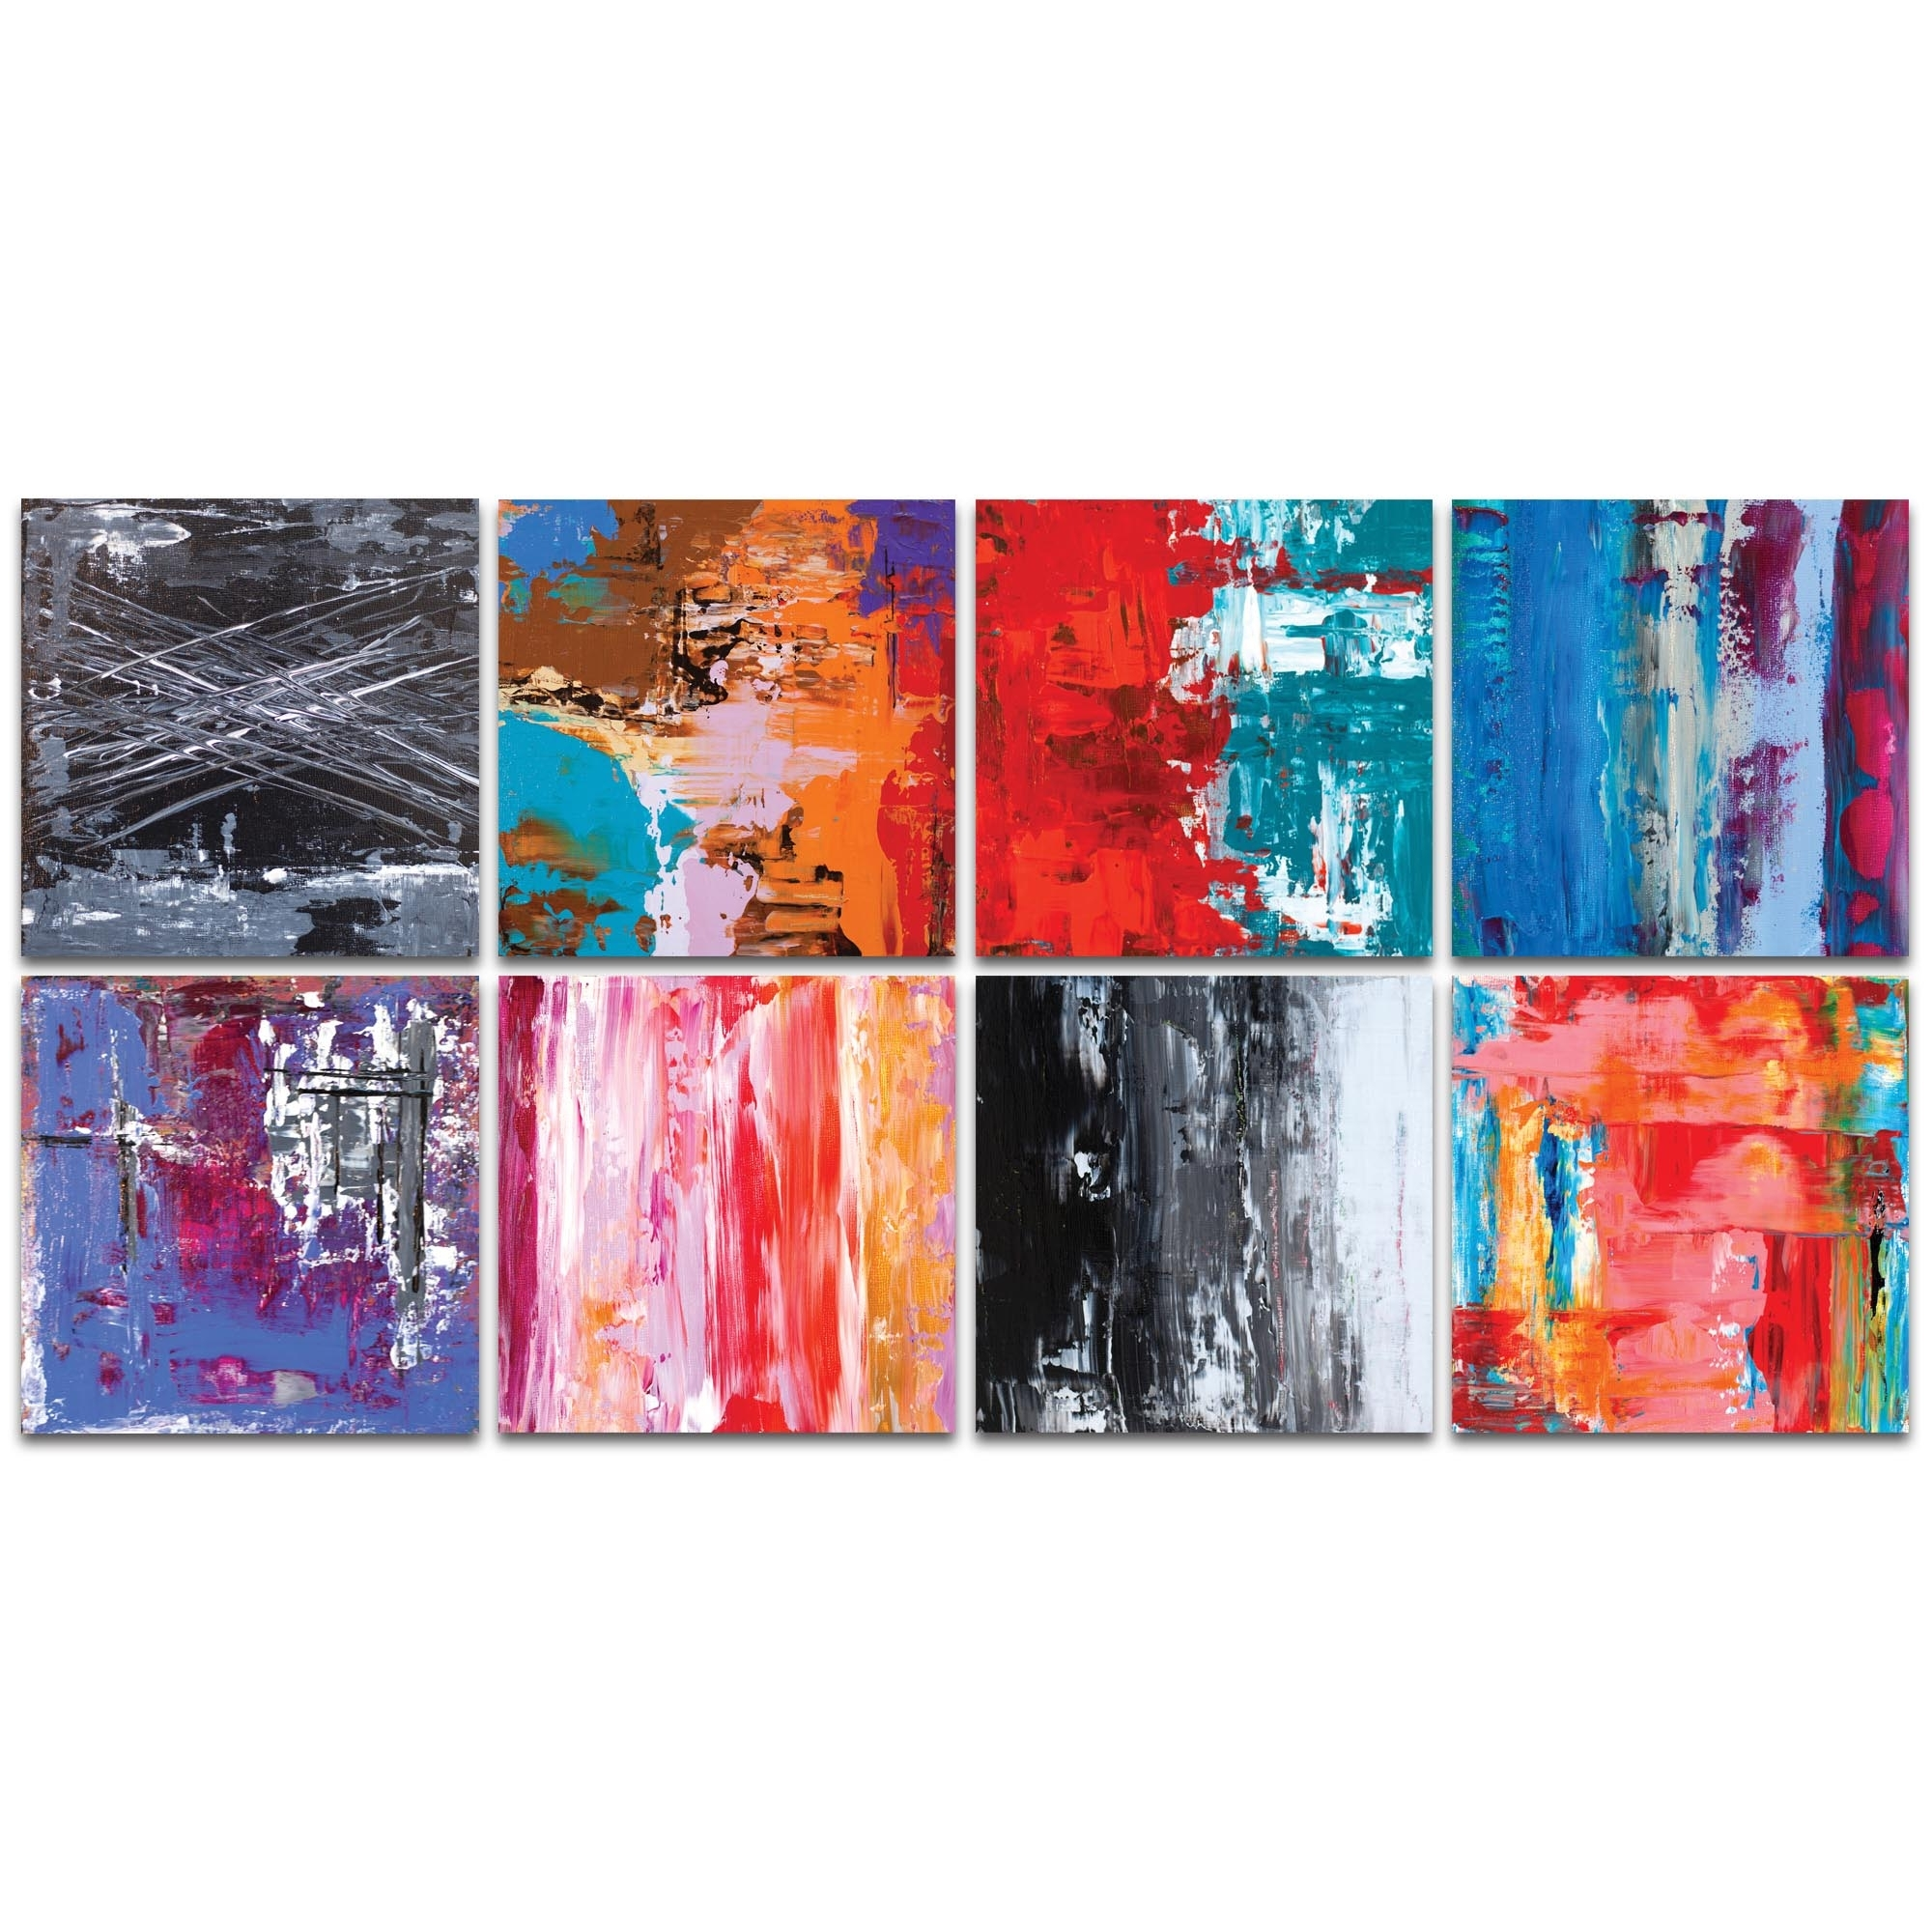 Metal Art Studio - Urban Windows Largeceleste Reiter - Abstract regarding Abstract Wall Art (Image 17 of 20)